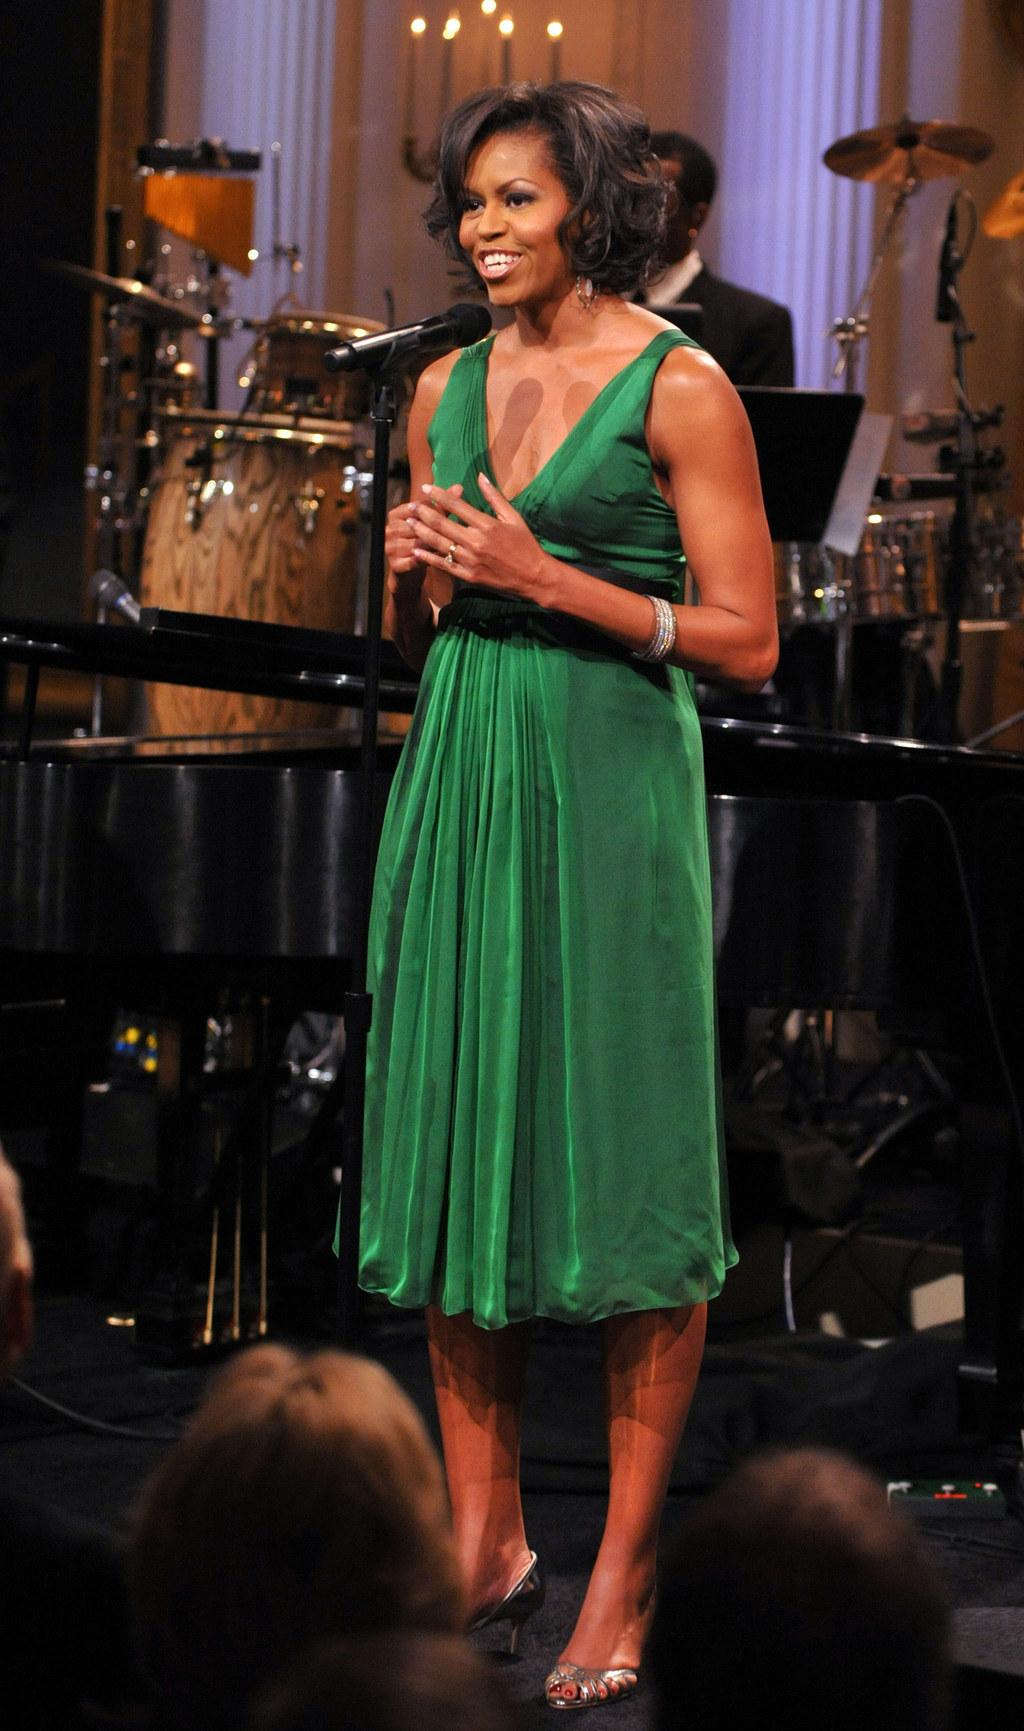 Aliza Vellani,Leisha Hailey born July 11, 1971 (age 47) Hot tube Pat Mills,Emily Peachey